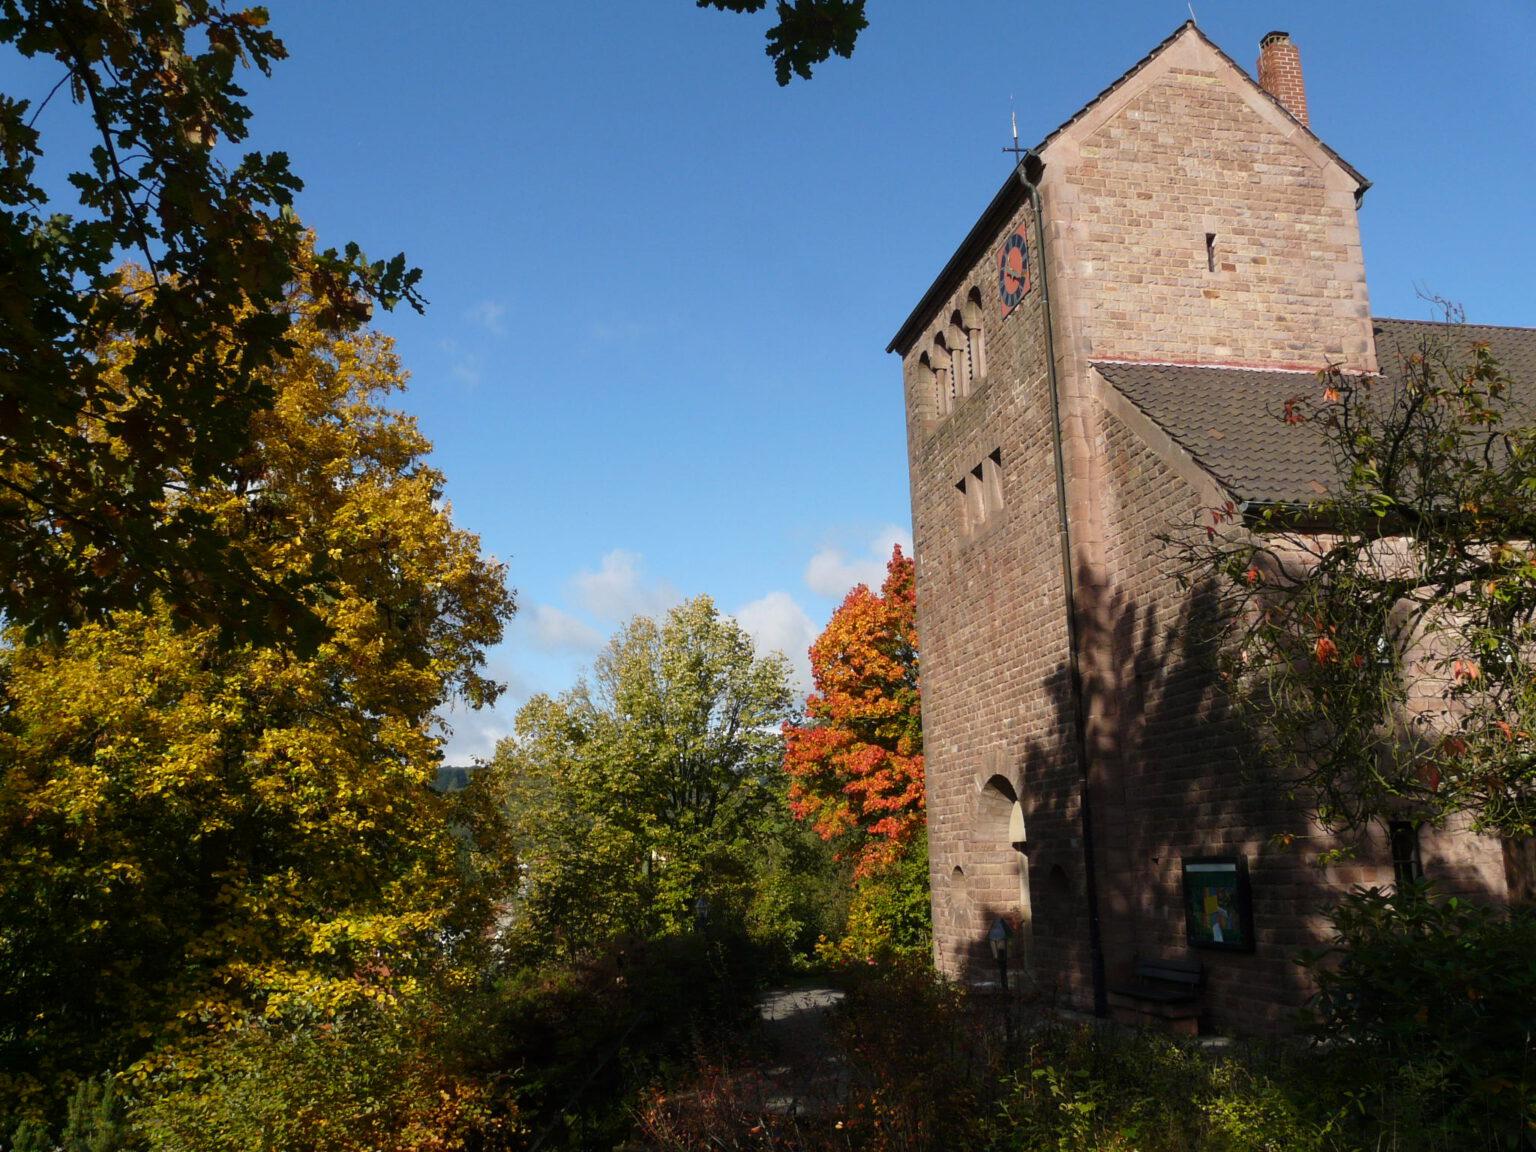 Herschweiler-Pettersheim